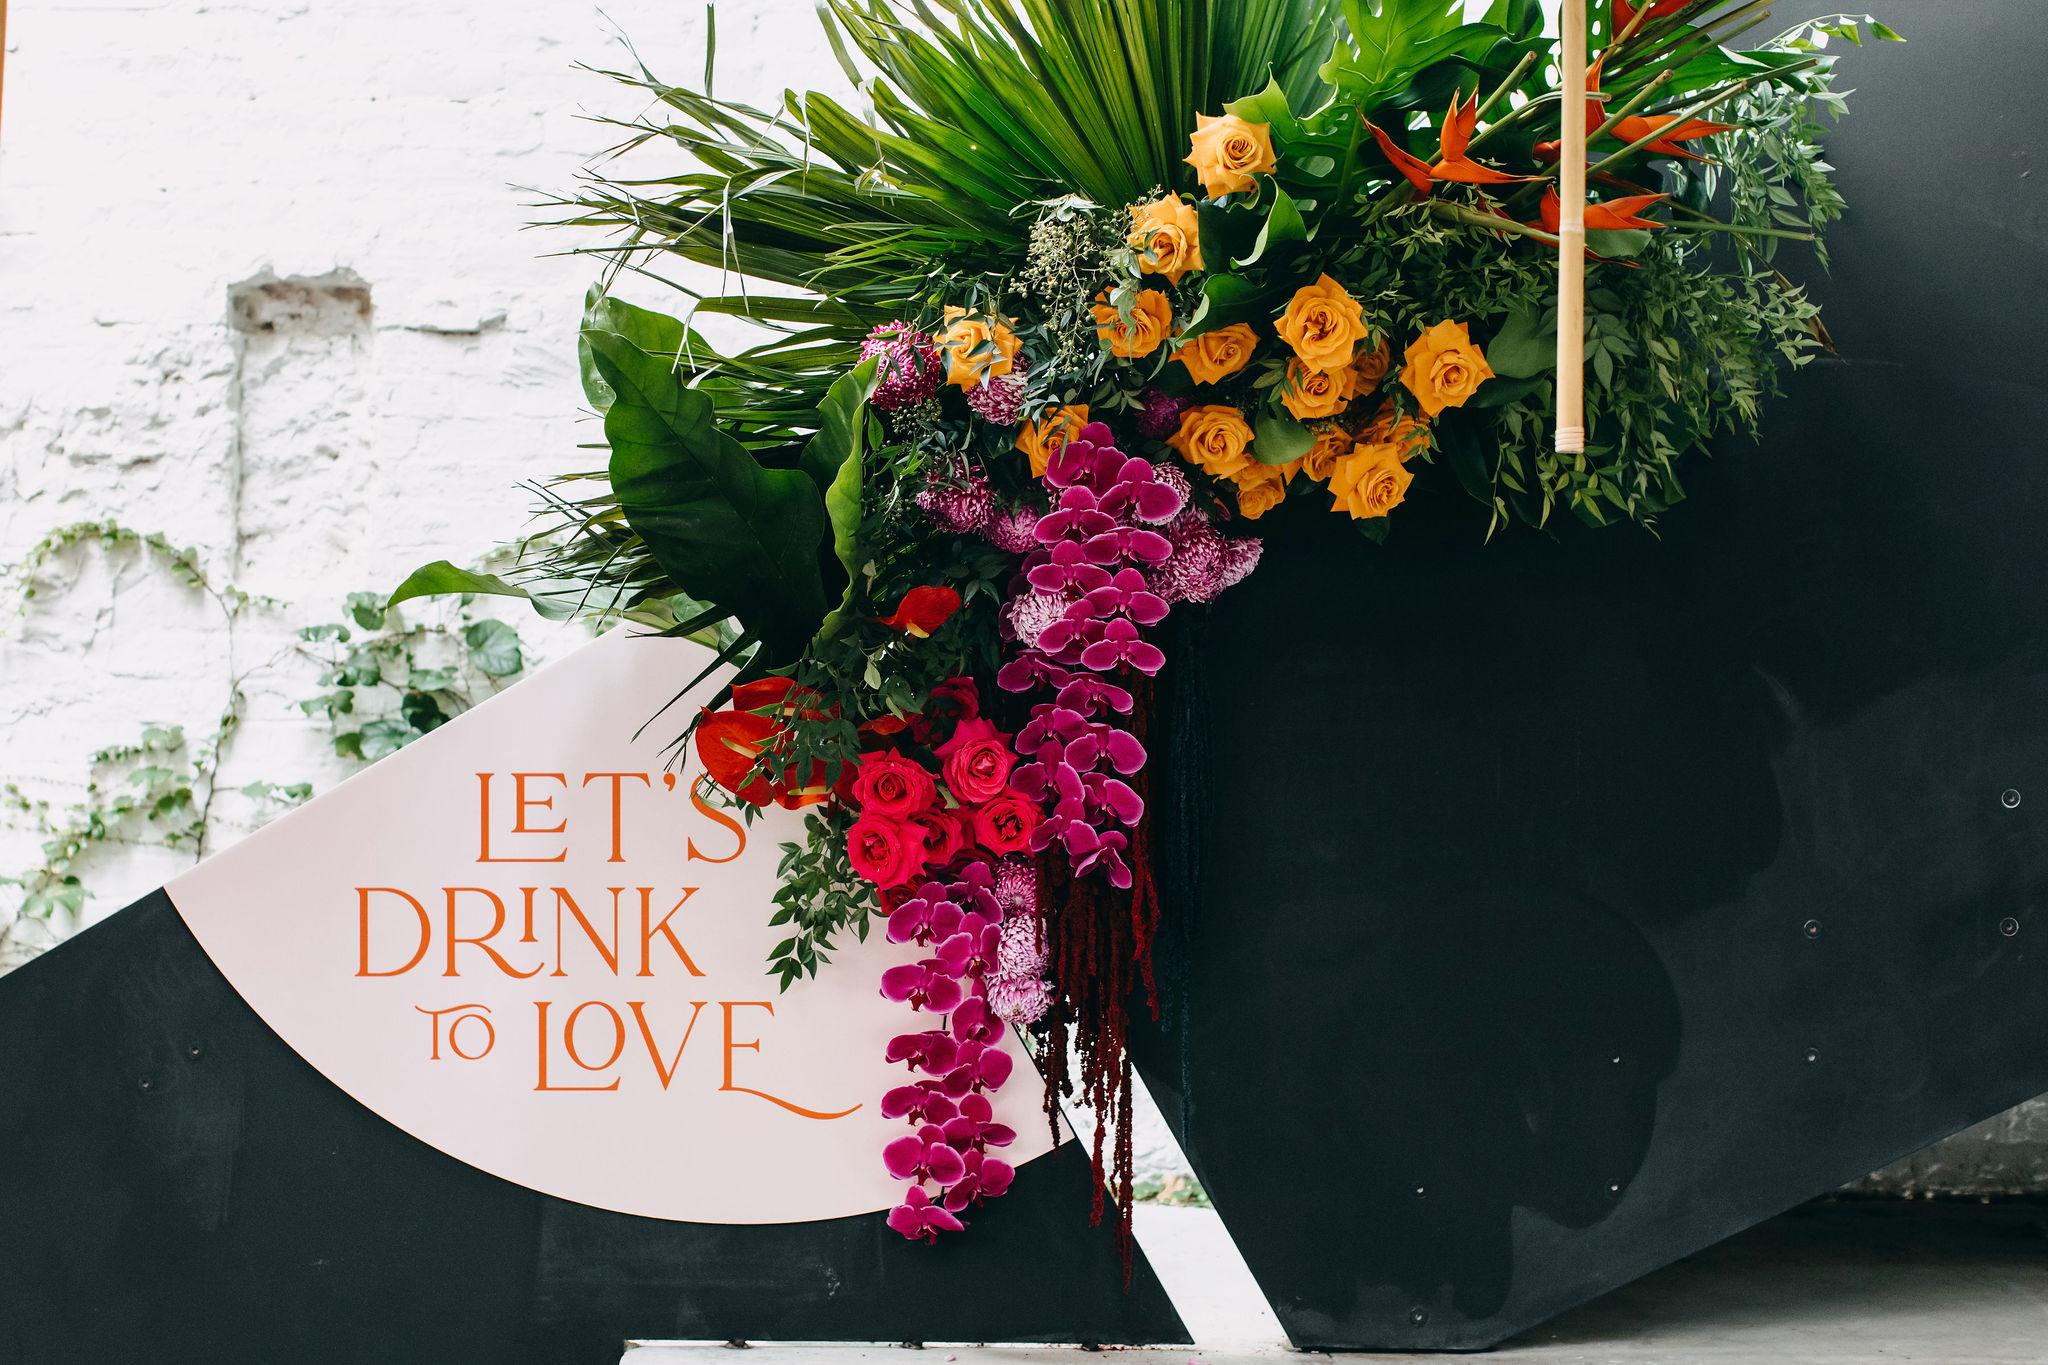 25-STATEBUILDINGS-WEDDINGOPENDAY-16FEB2020